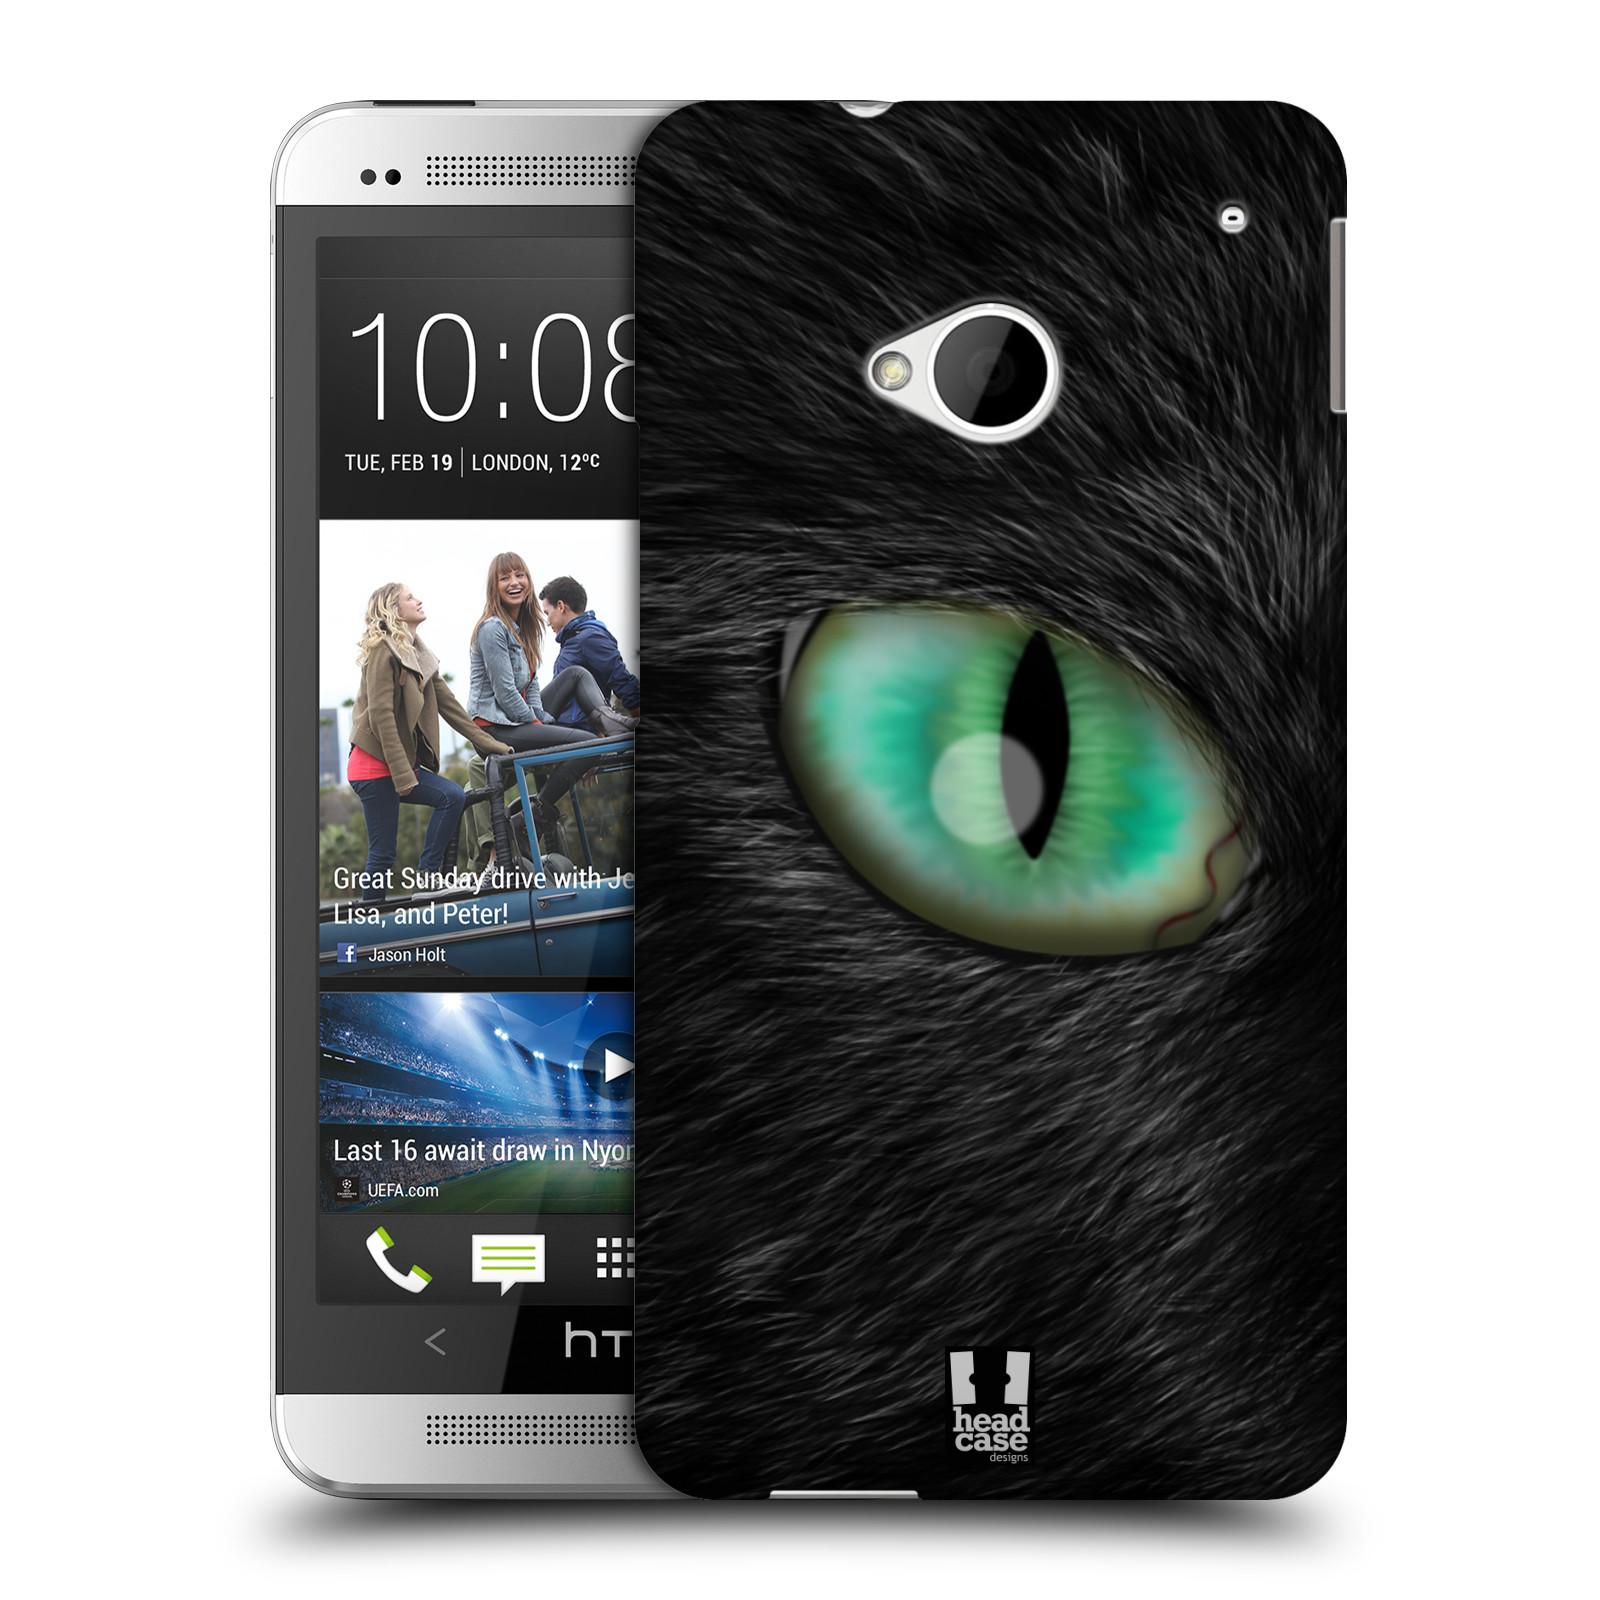 HEAD CASE plastový obal na mobil HTC One (M7) vzor pohled zvířete oko kočka